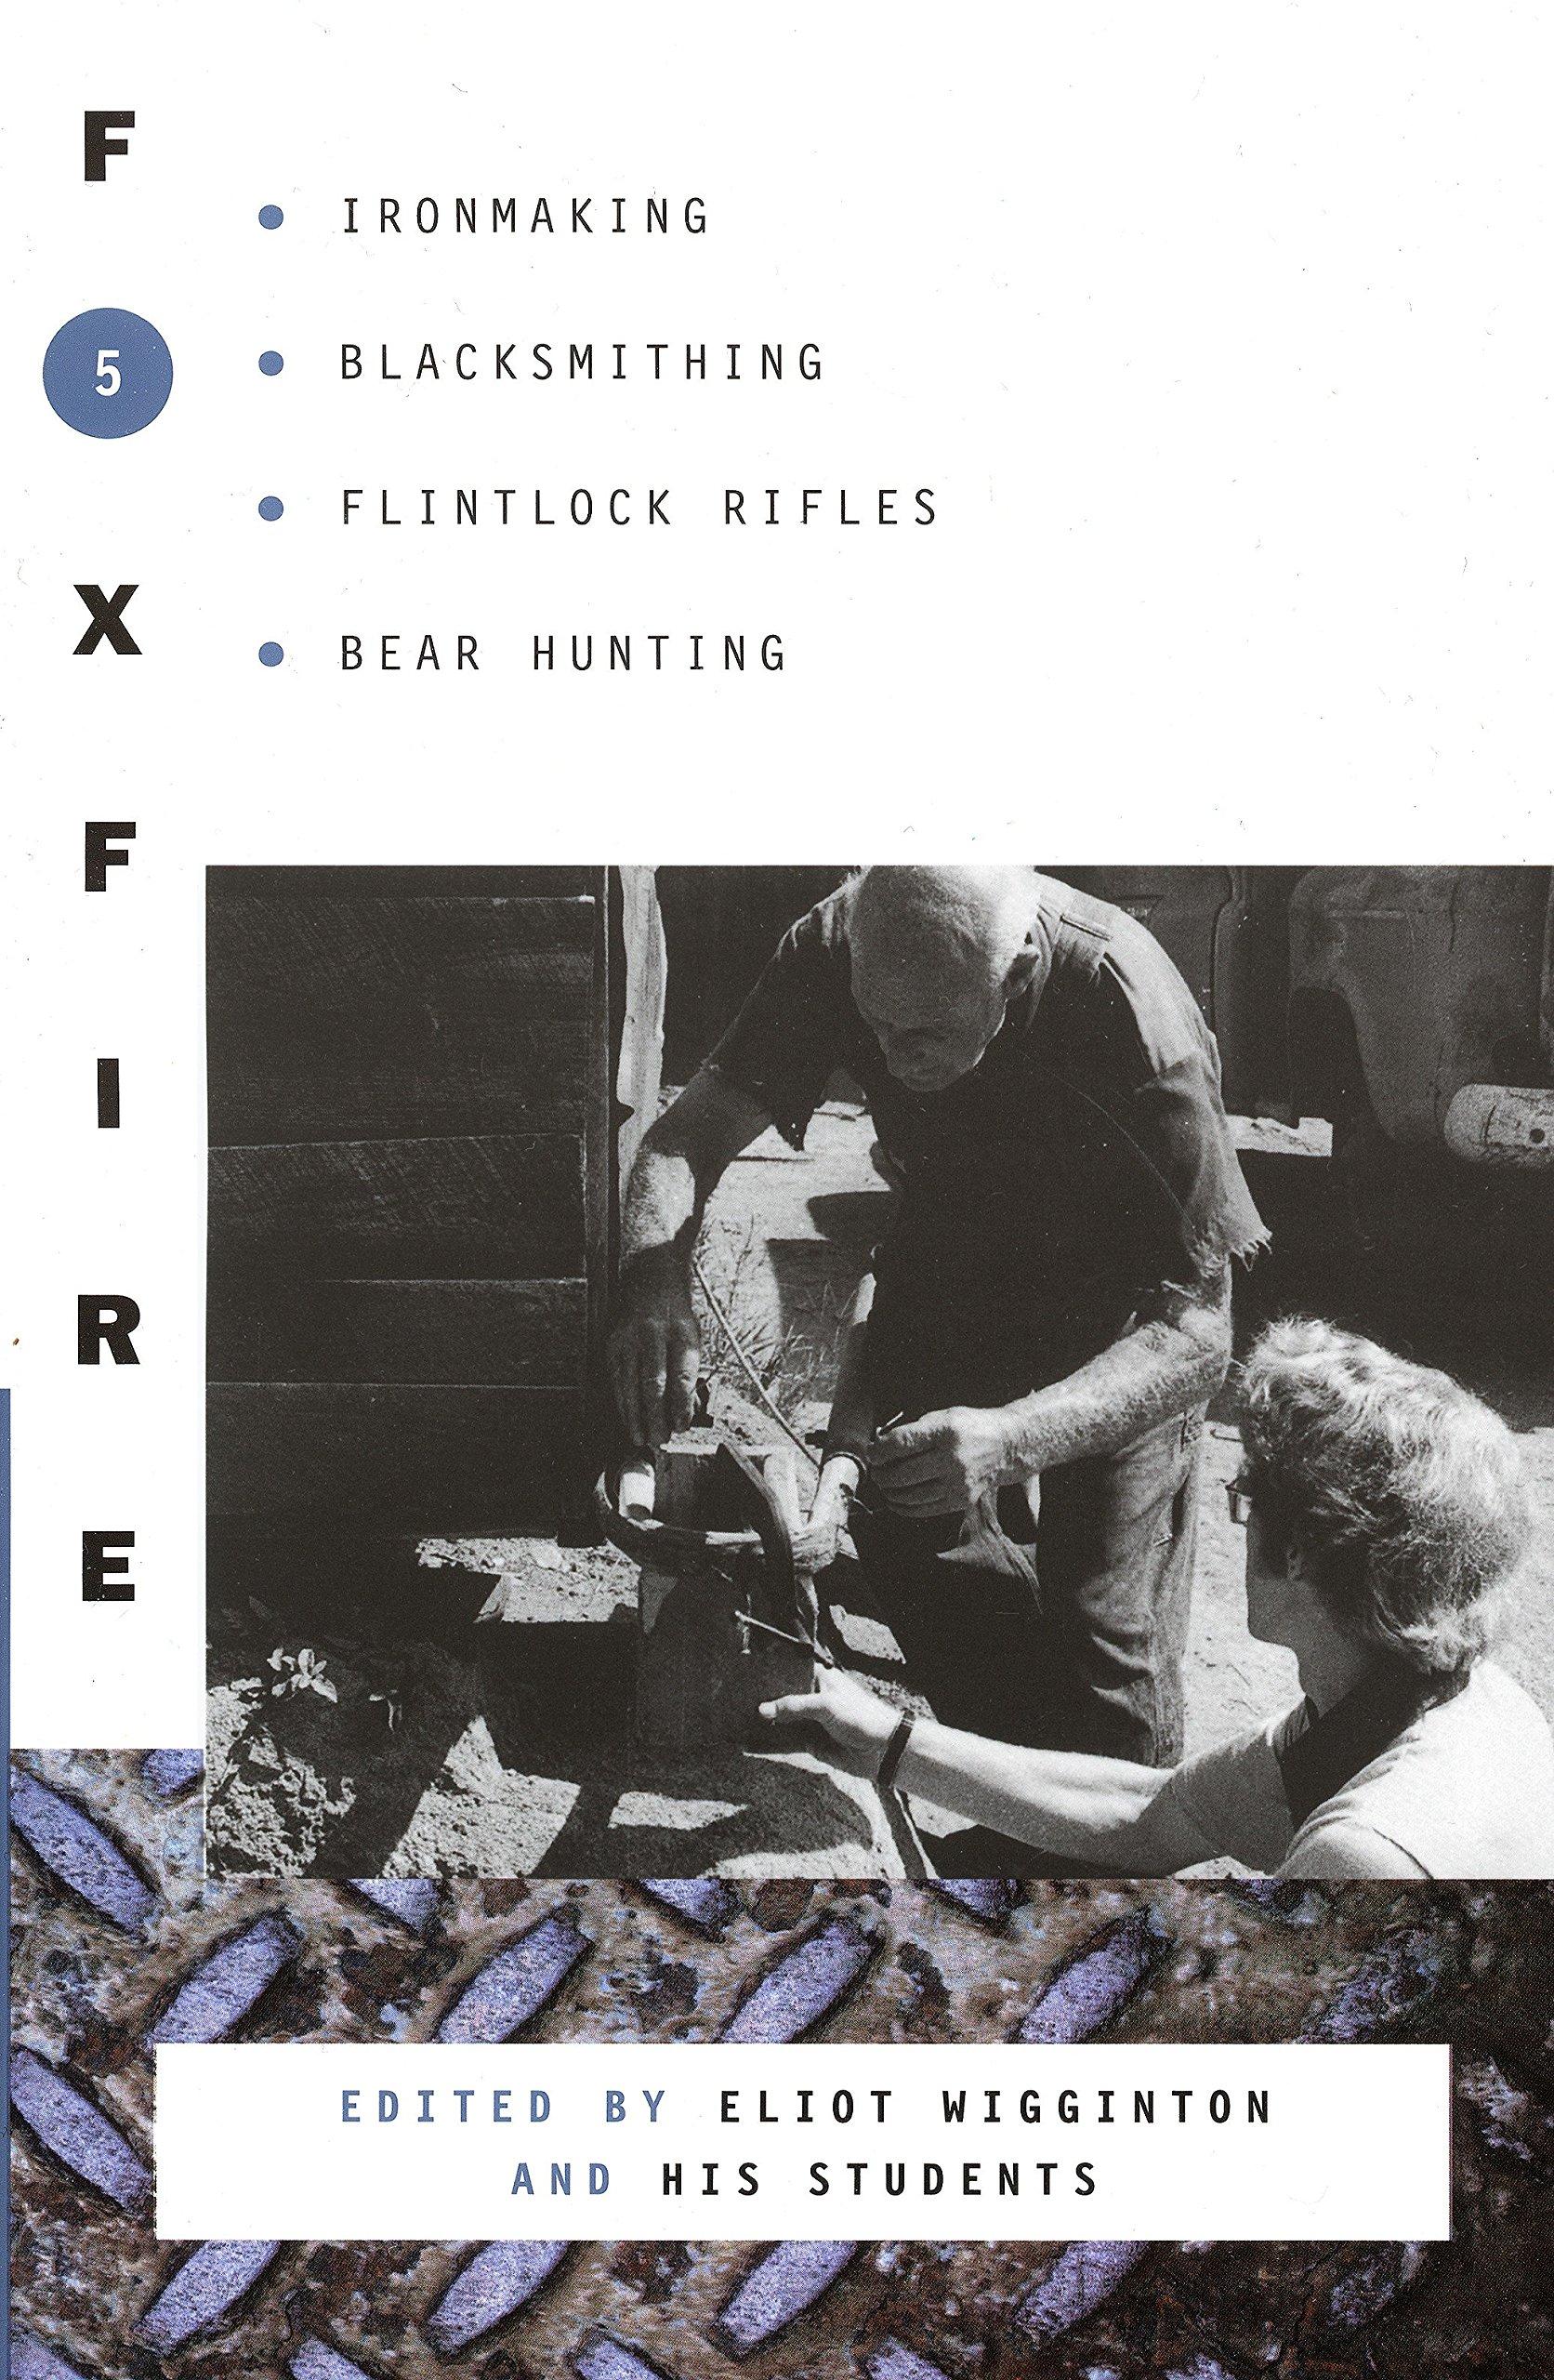 Foxfire 5: Ironmaking, Blacksmithing, Flintlock Rifles, Bear Hunting, and Other Affairs of Plain Living  (Foxfire Series)